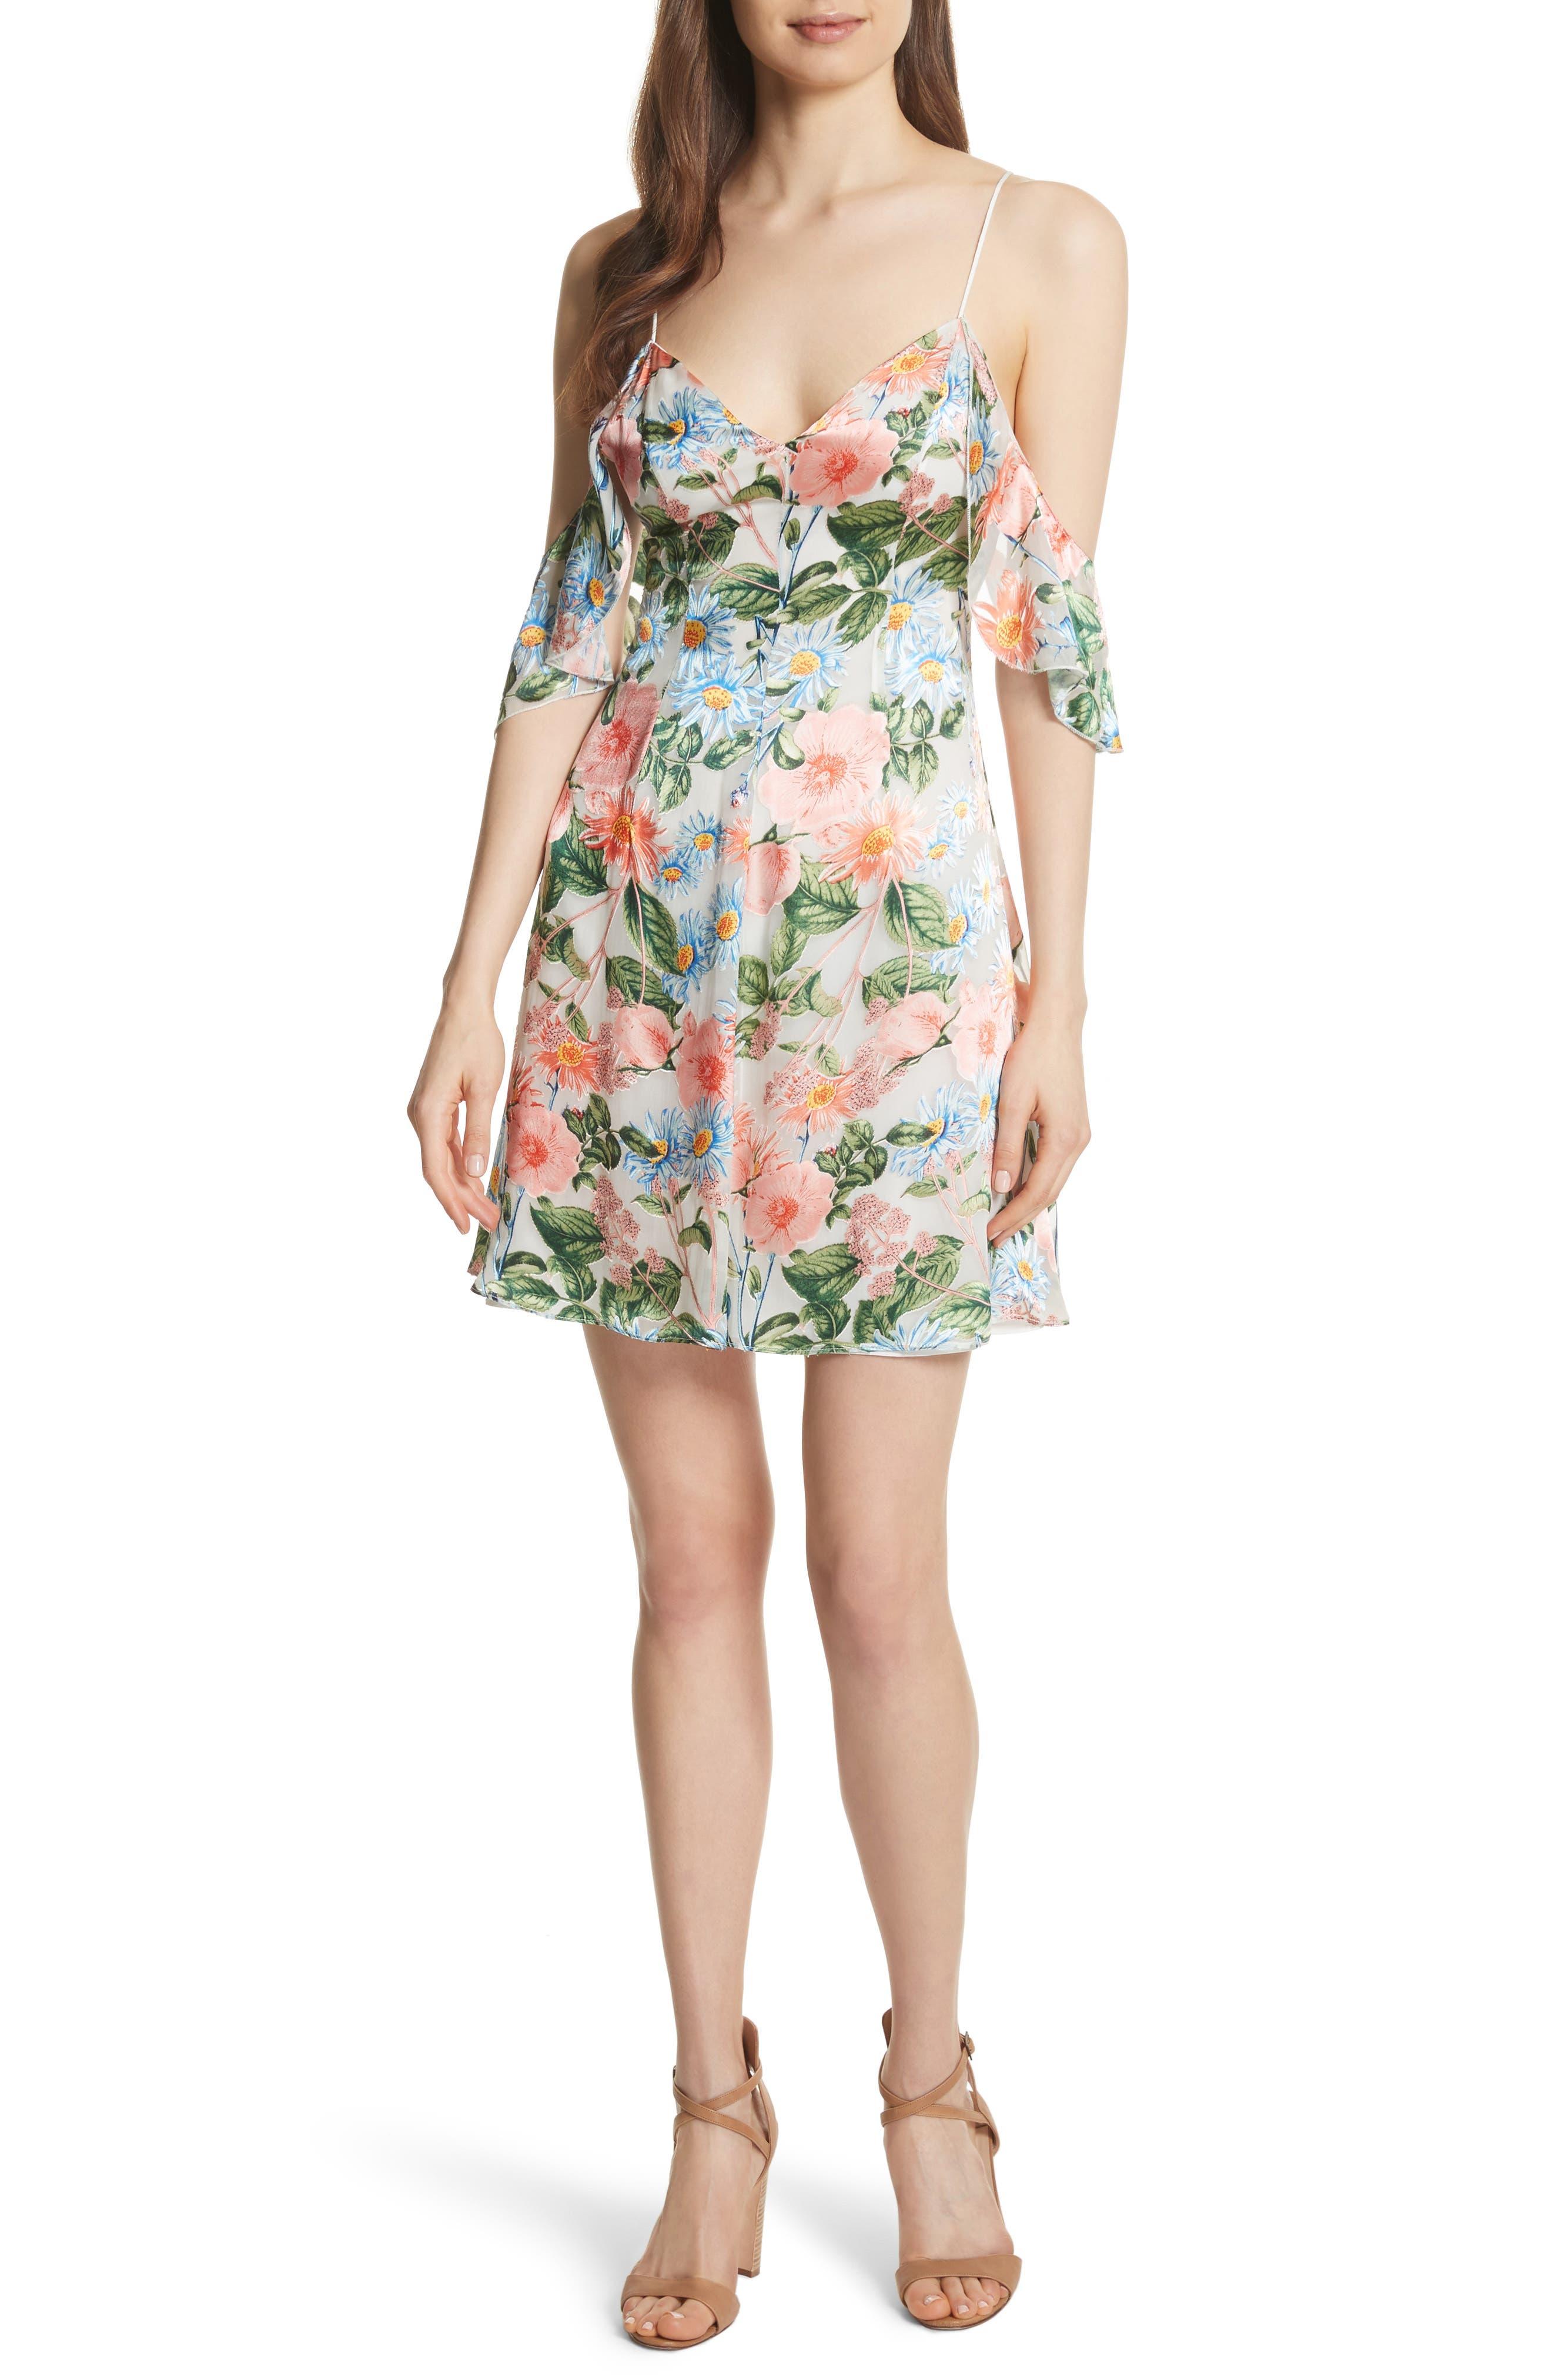 Alves Floral Cold Shoulder Dress,                         Main,                         color, Floral Fields